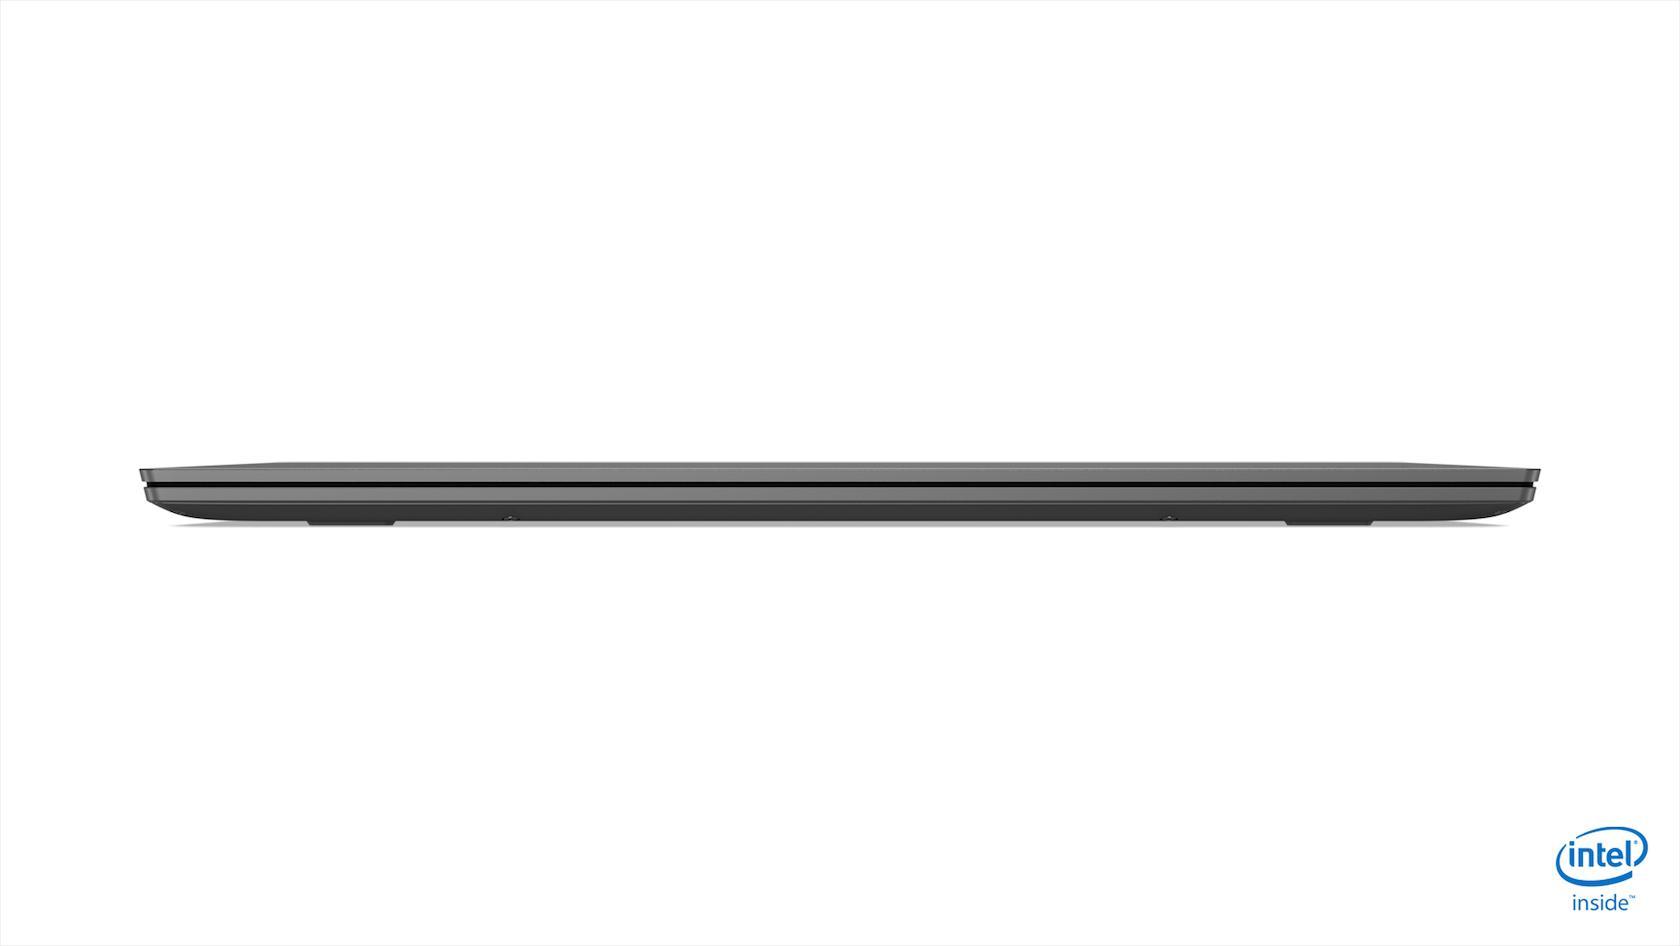 Lenovo Yoga S730 Is An Ultra Sleek Compromise Free Macbook